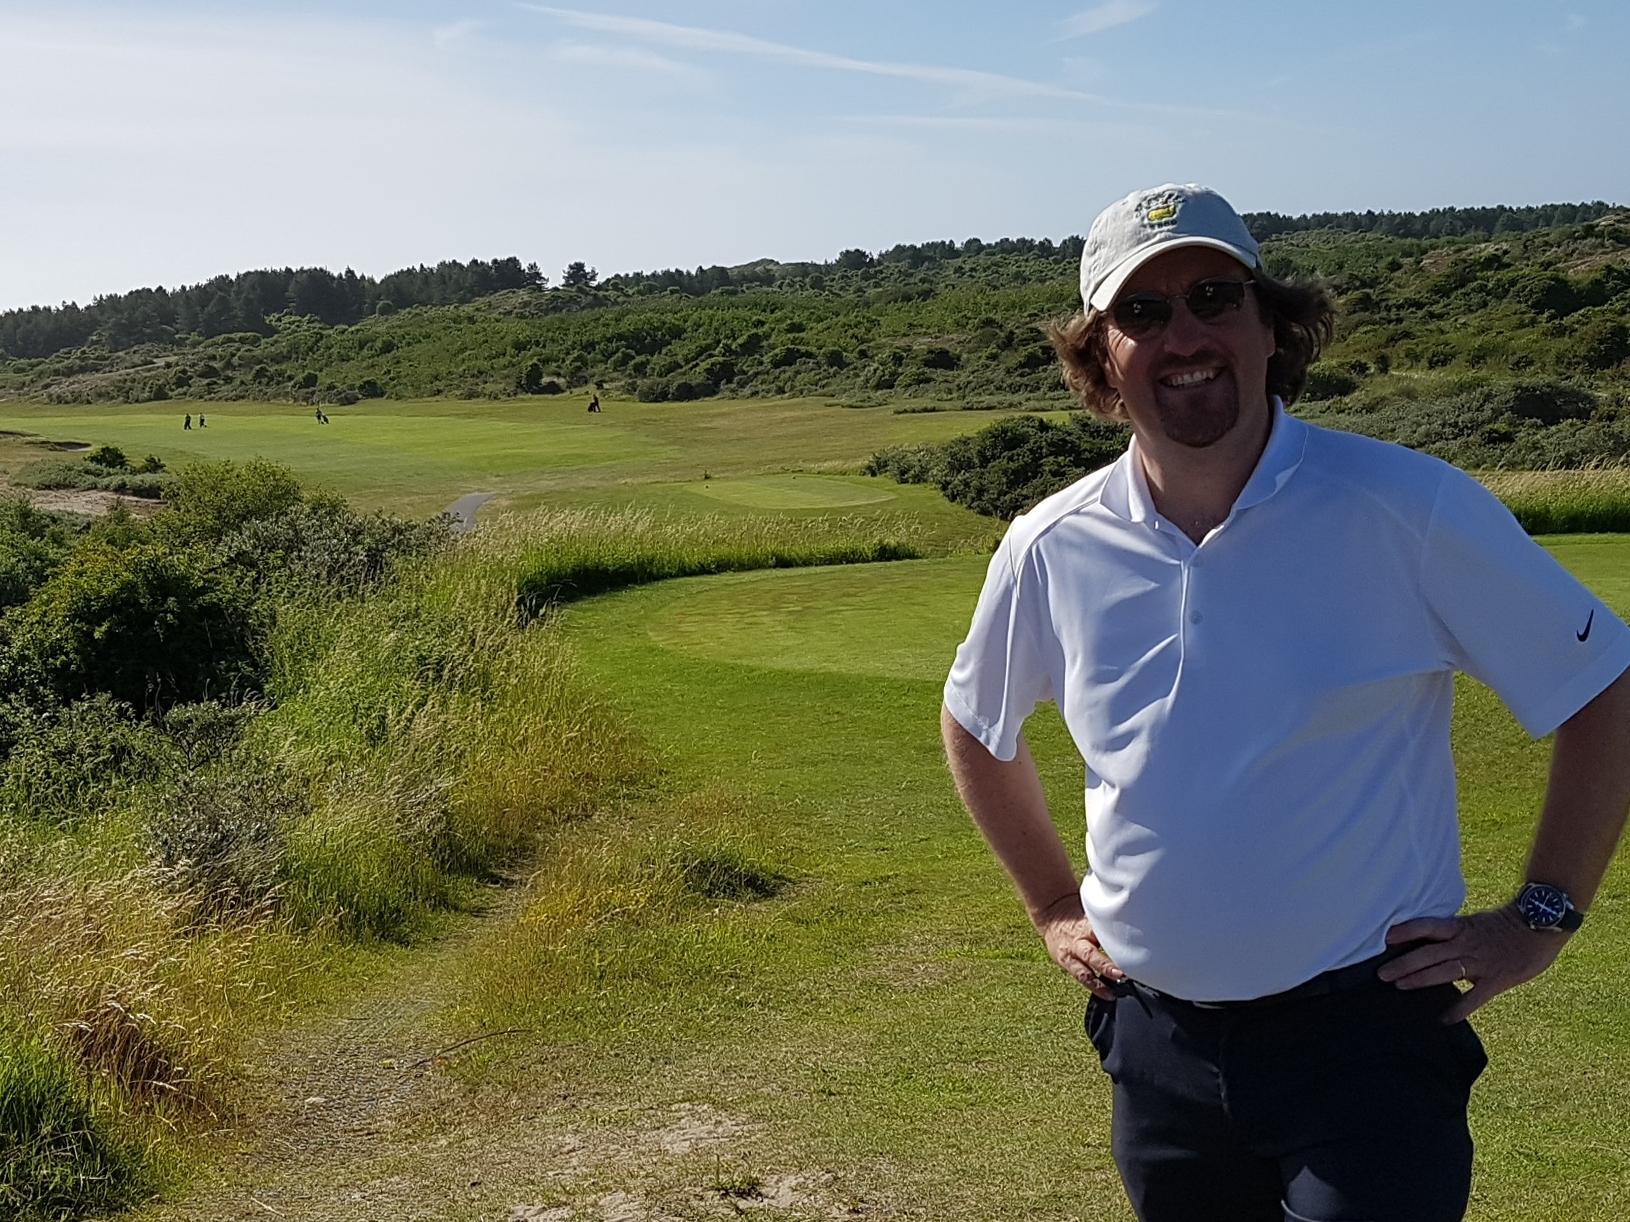 Avatar of golfer named Kurt Martens